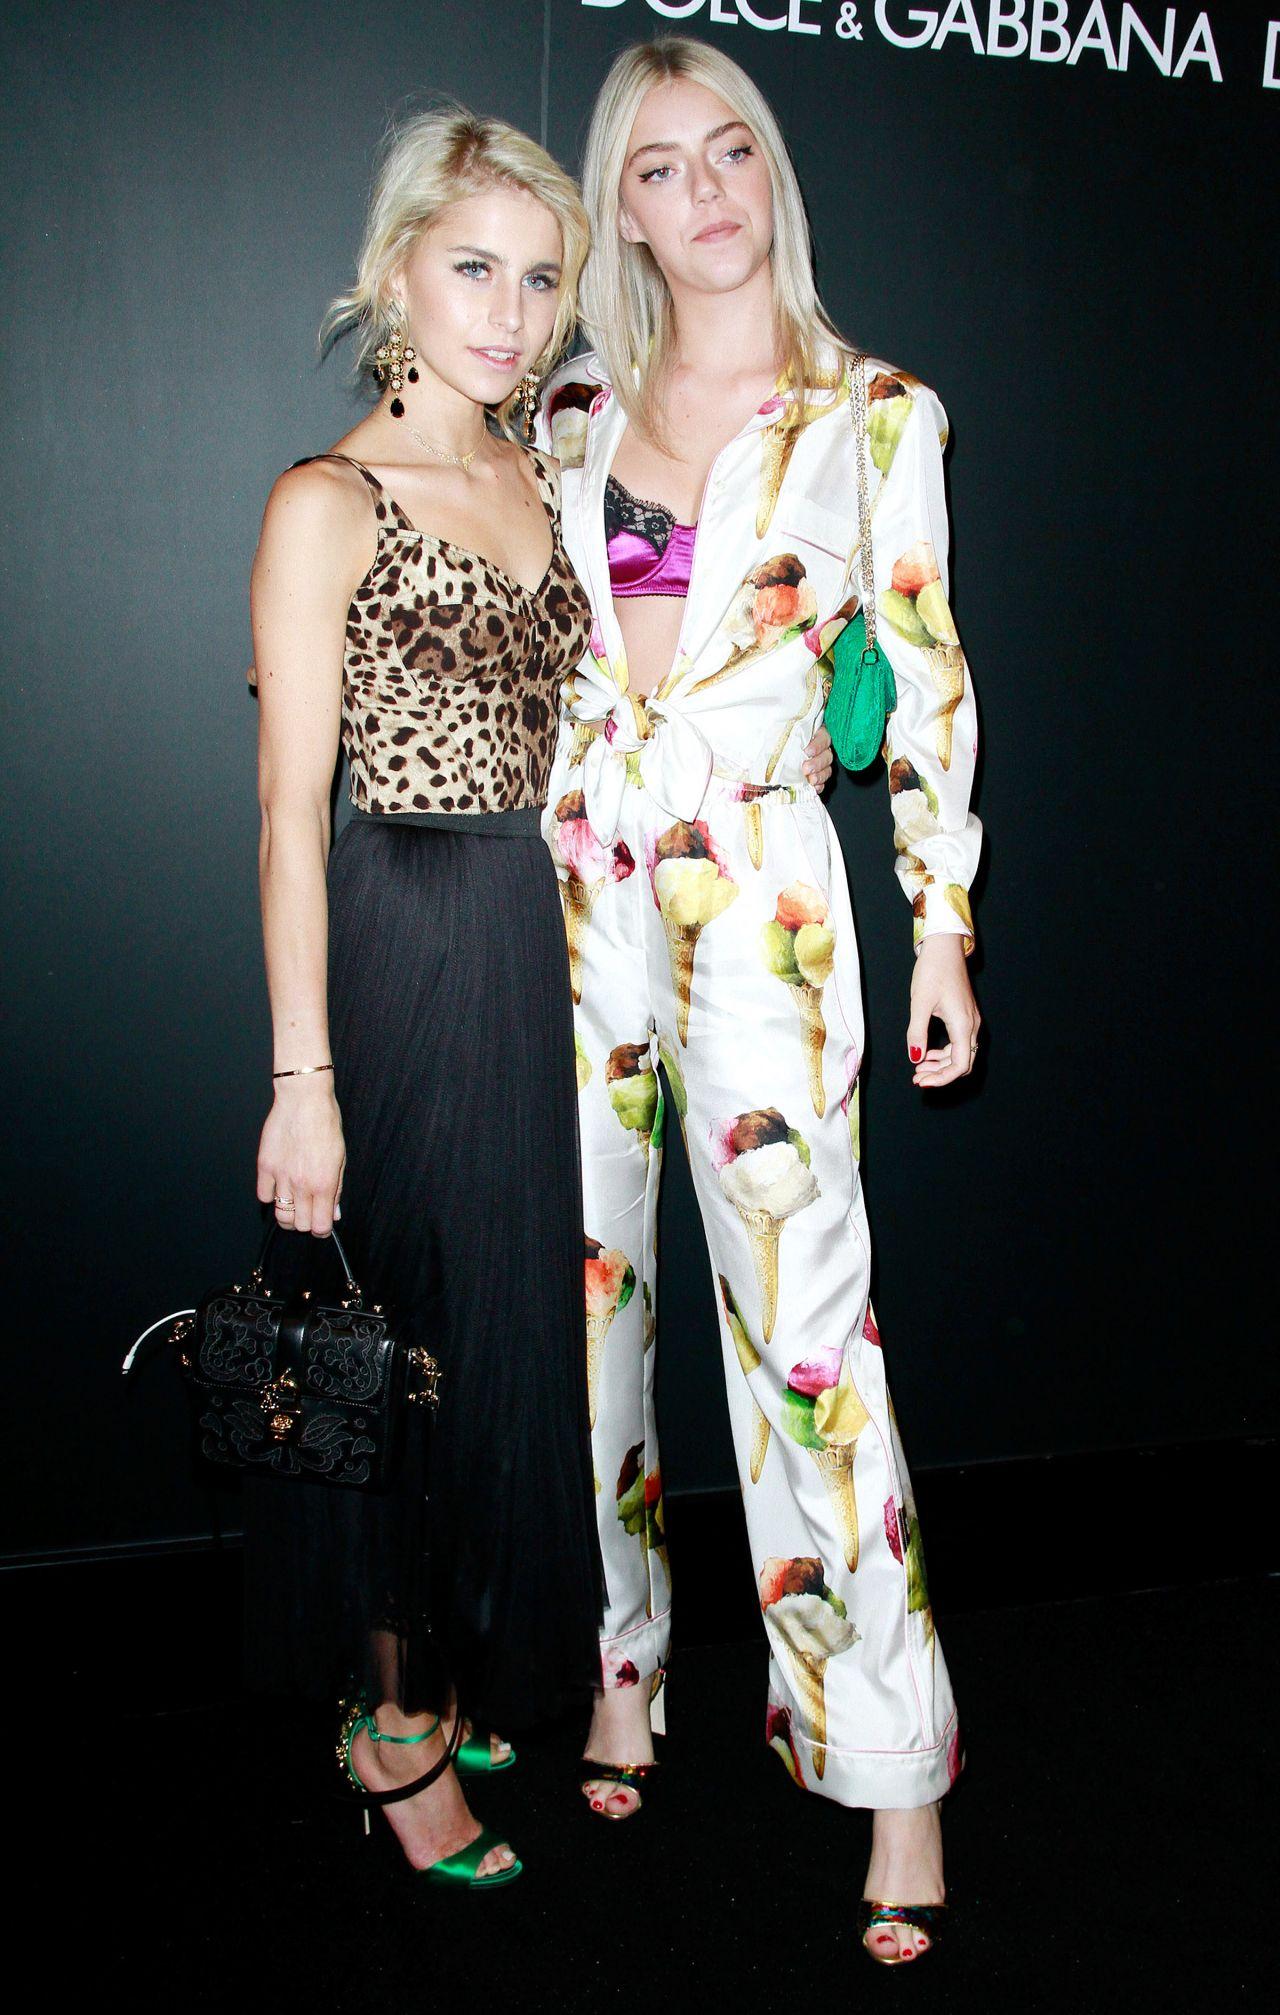 a432b5d9212d9 Caroline Daur and Pyper America Smith – Dolce   Gabbana Party at JK  Iguatemi Sao Paulo 04 25 2017